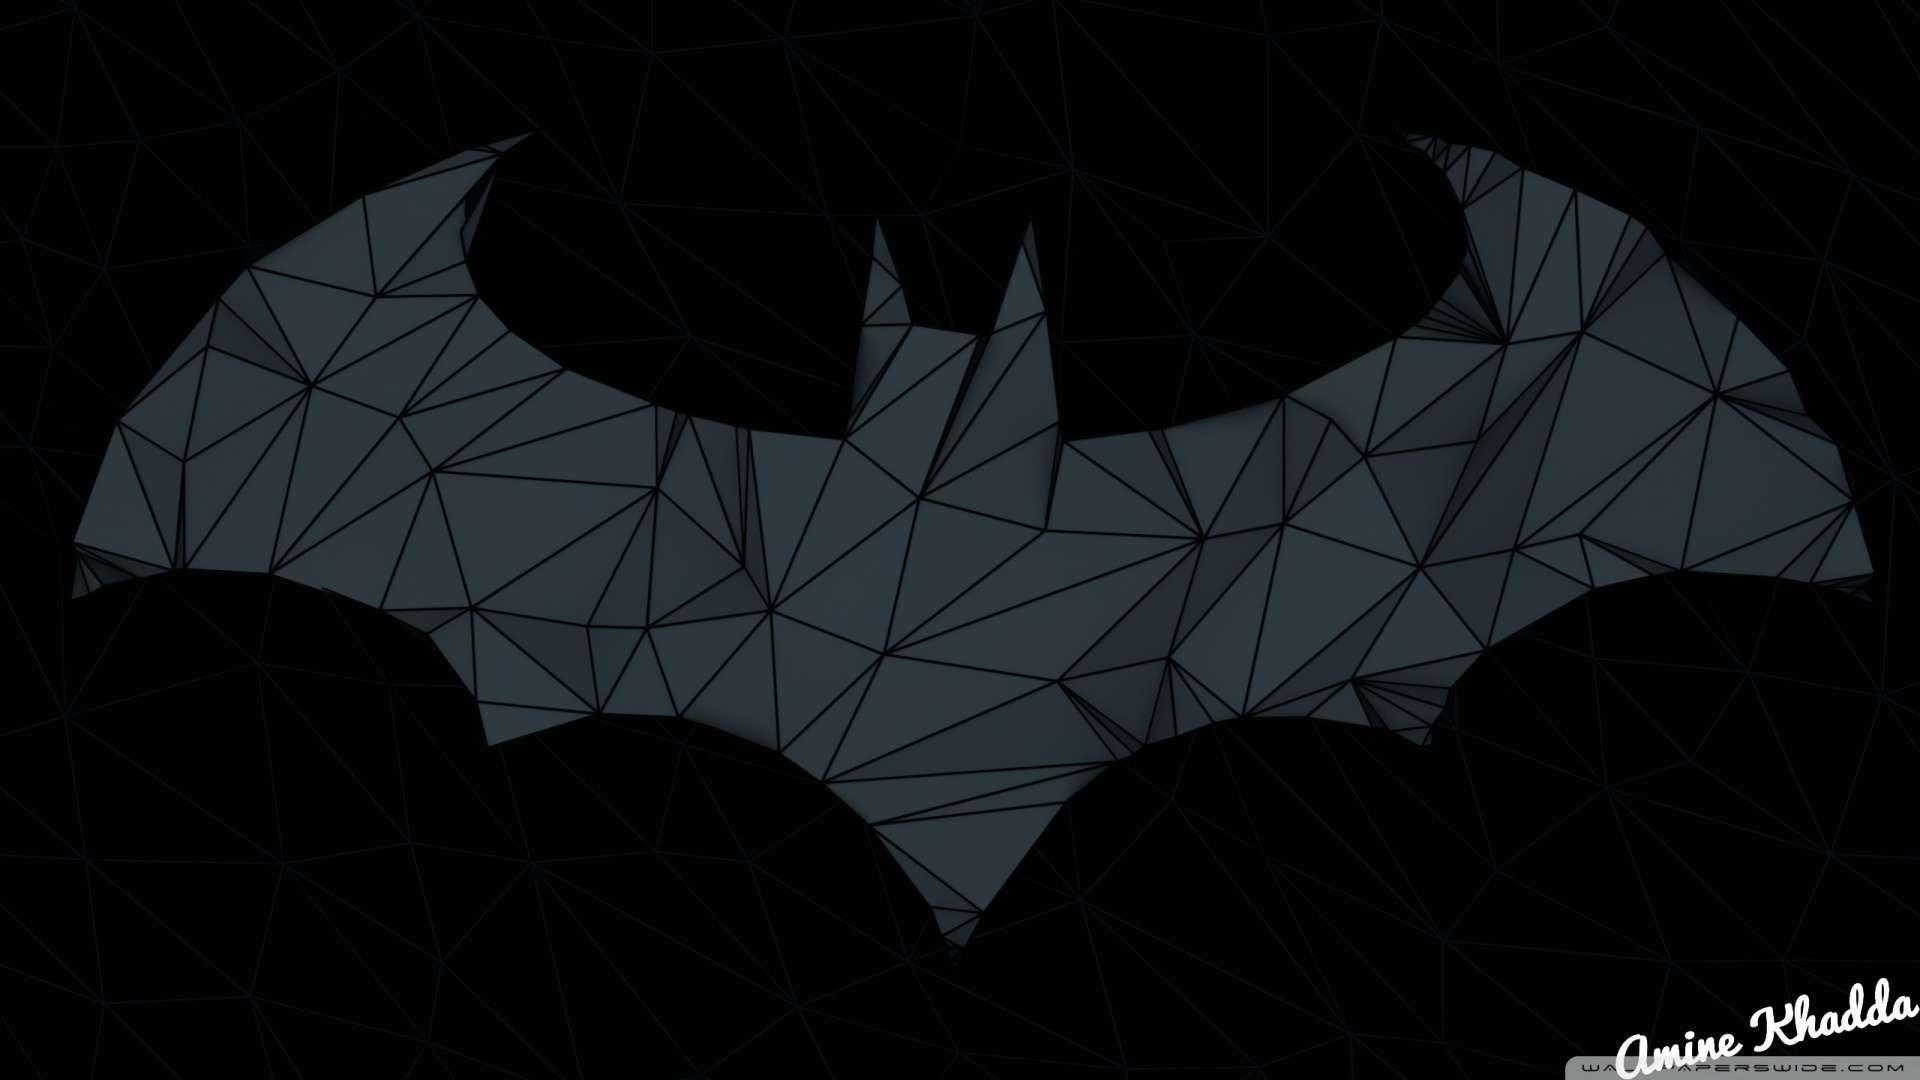 1080p batman wallpaper wallpapersafari download now batman arkham origins low poly logo 2 wallpaper 1080p hd 1920x1080 voltagebd Image collections